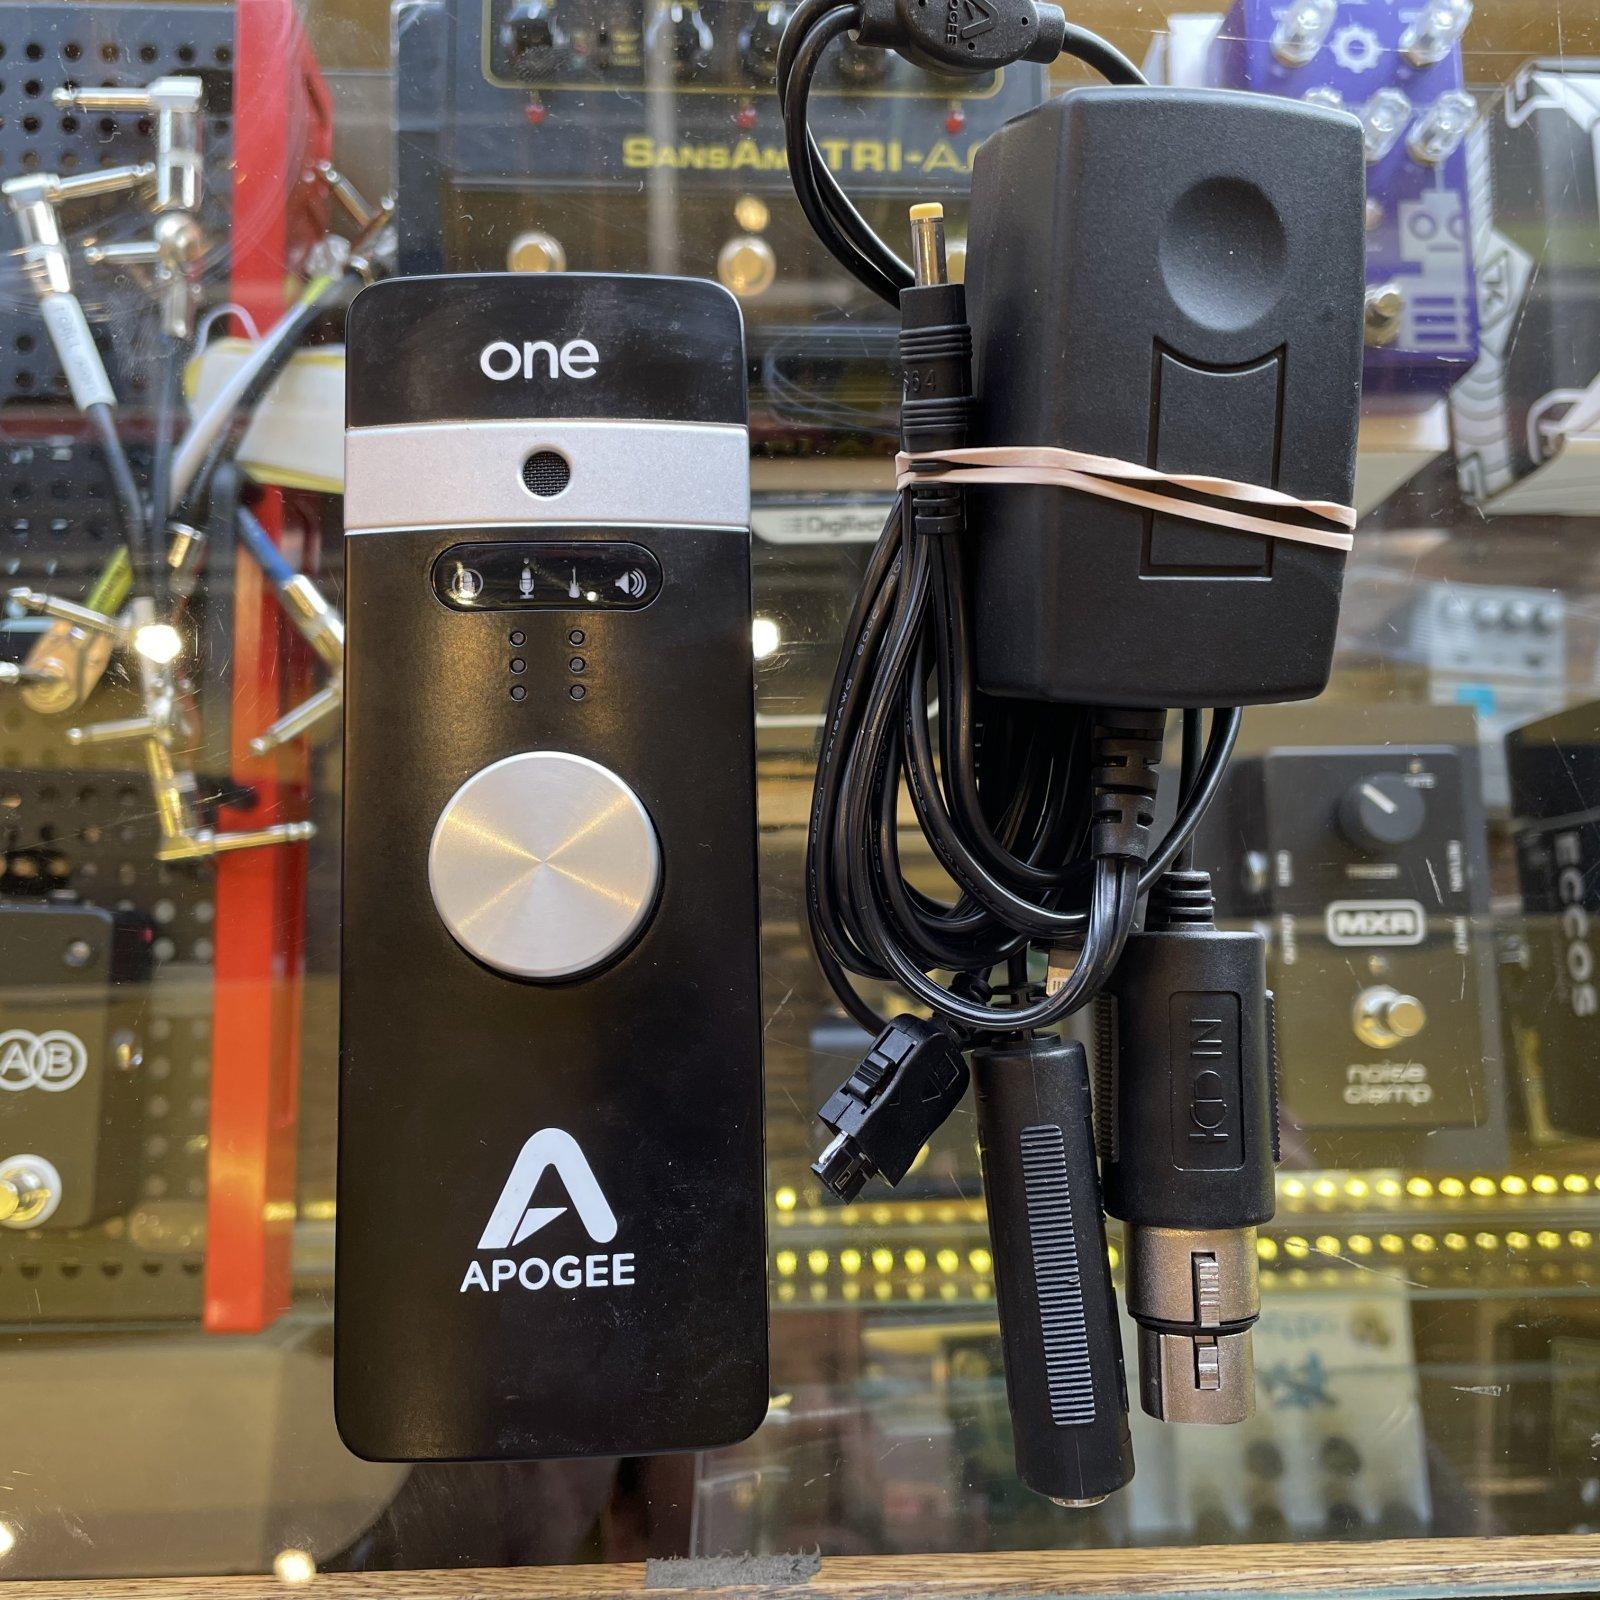 Apogee ONE 2x2 24-Bit 96kHz USB Audio Interface for iOS and Mac